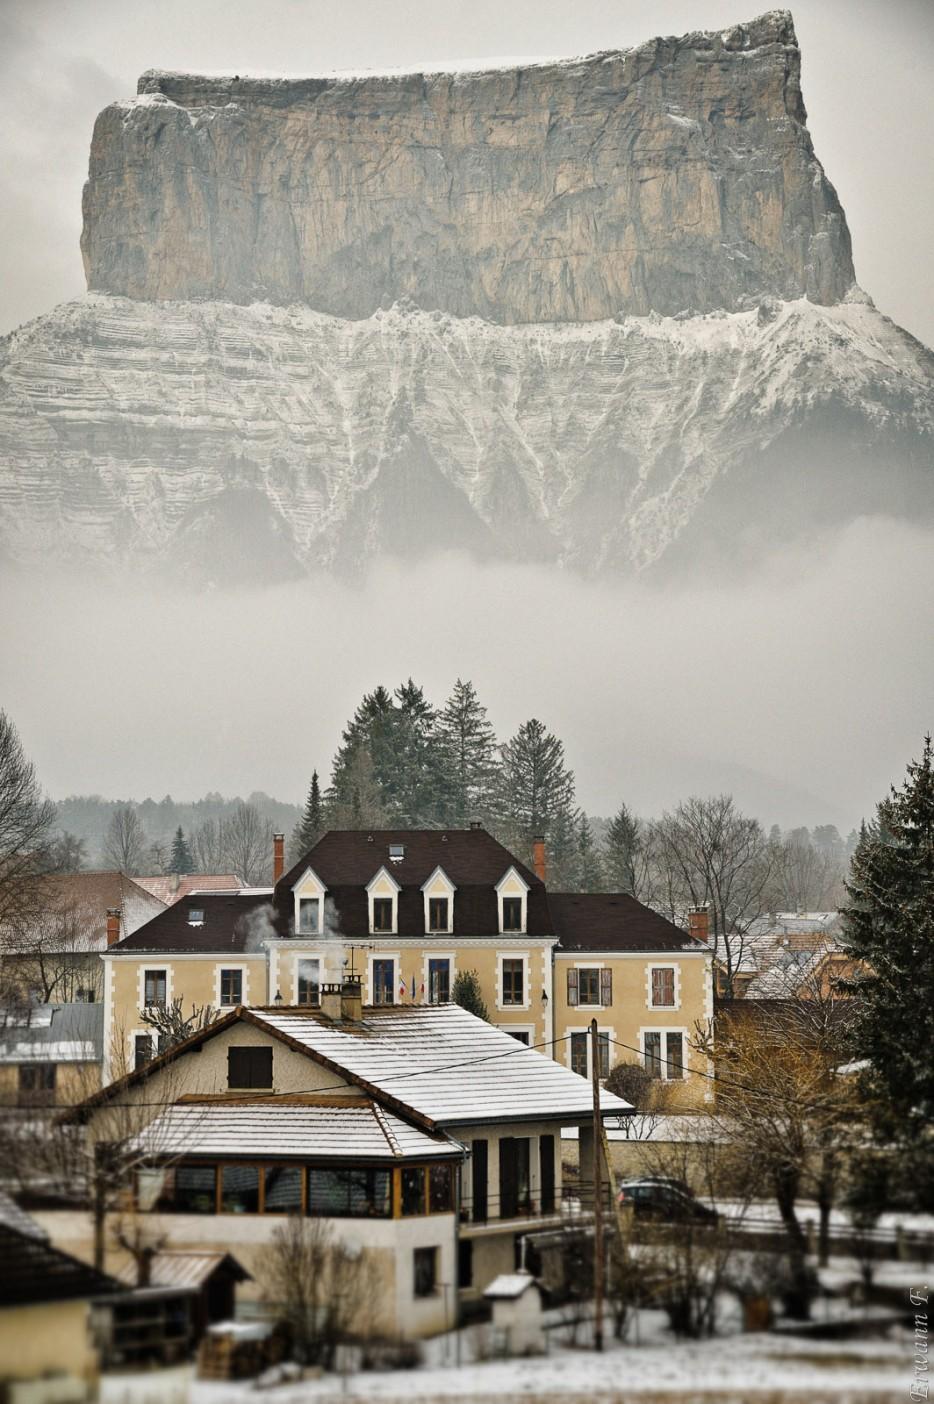 9. Chichilianne, Rhone Alpes in France